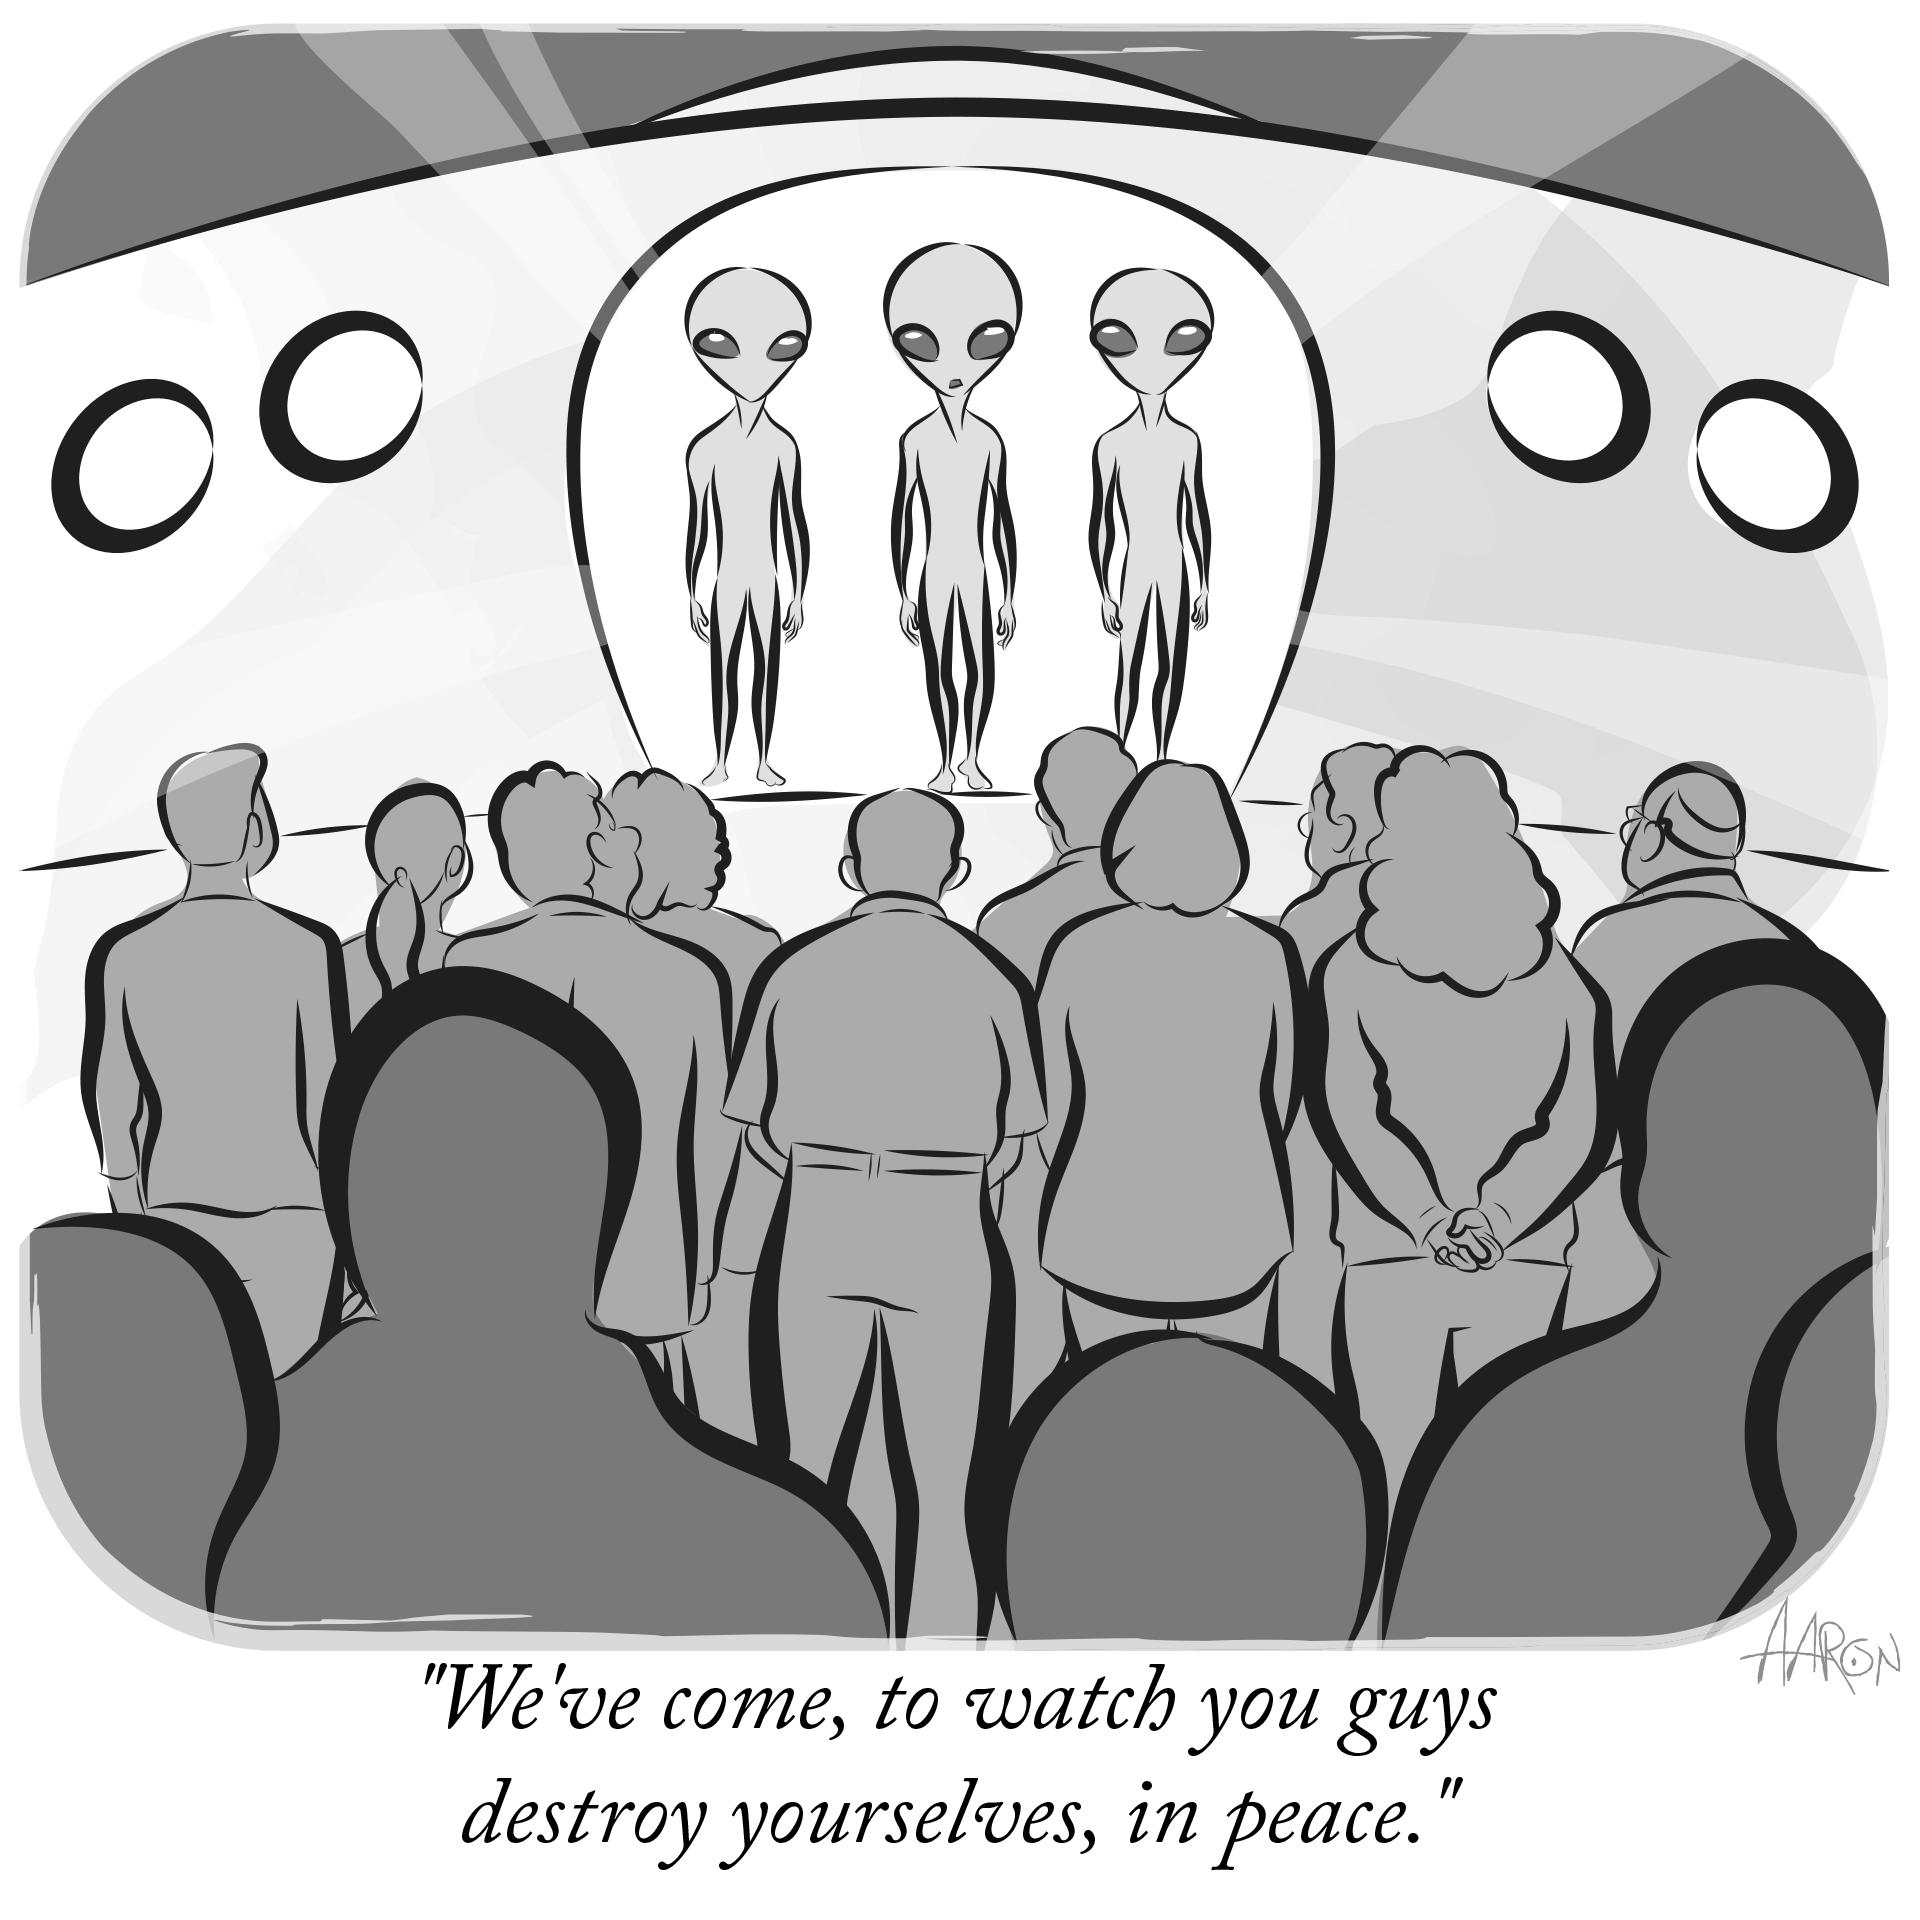 Alien invasion of privacy